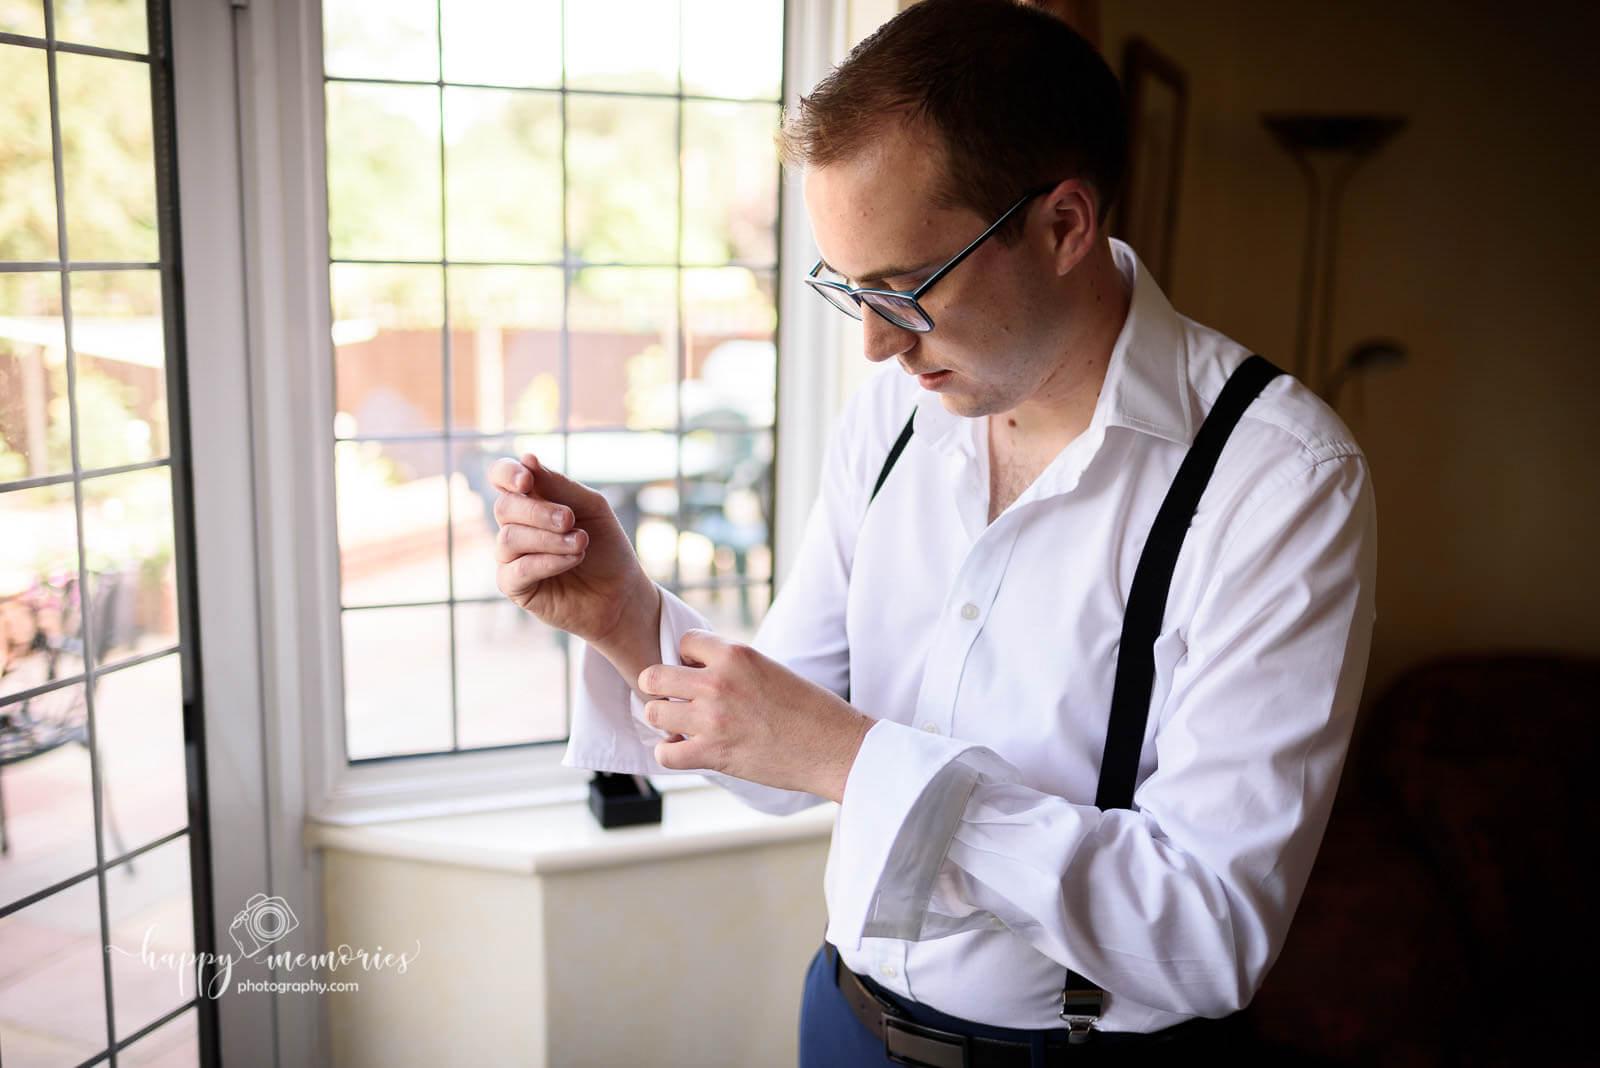 Wedding photographer East Grinstead-11